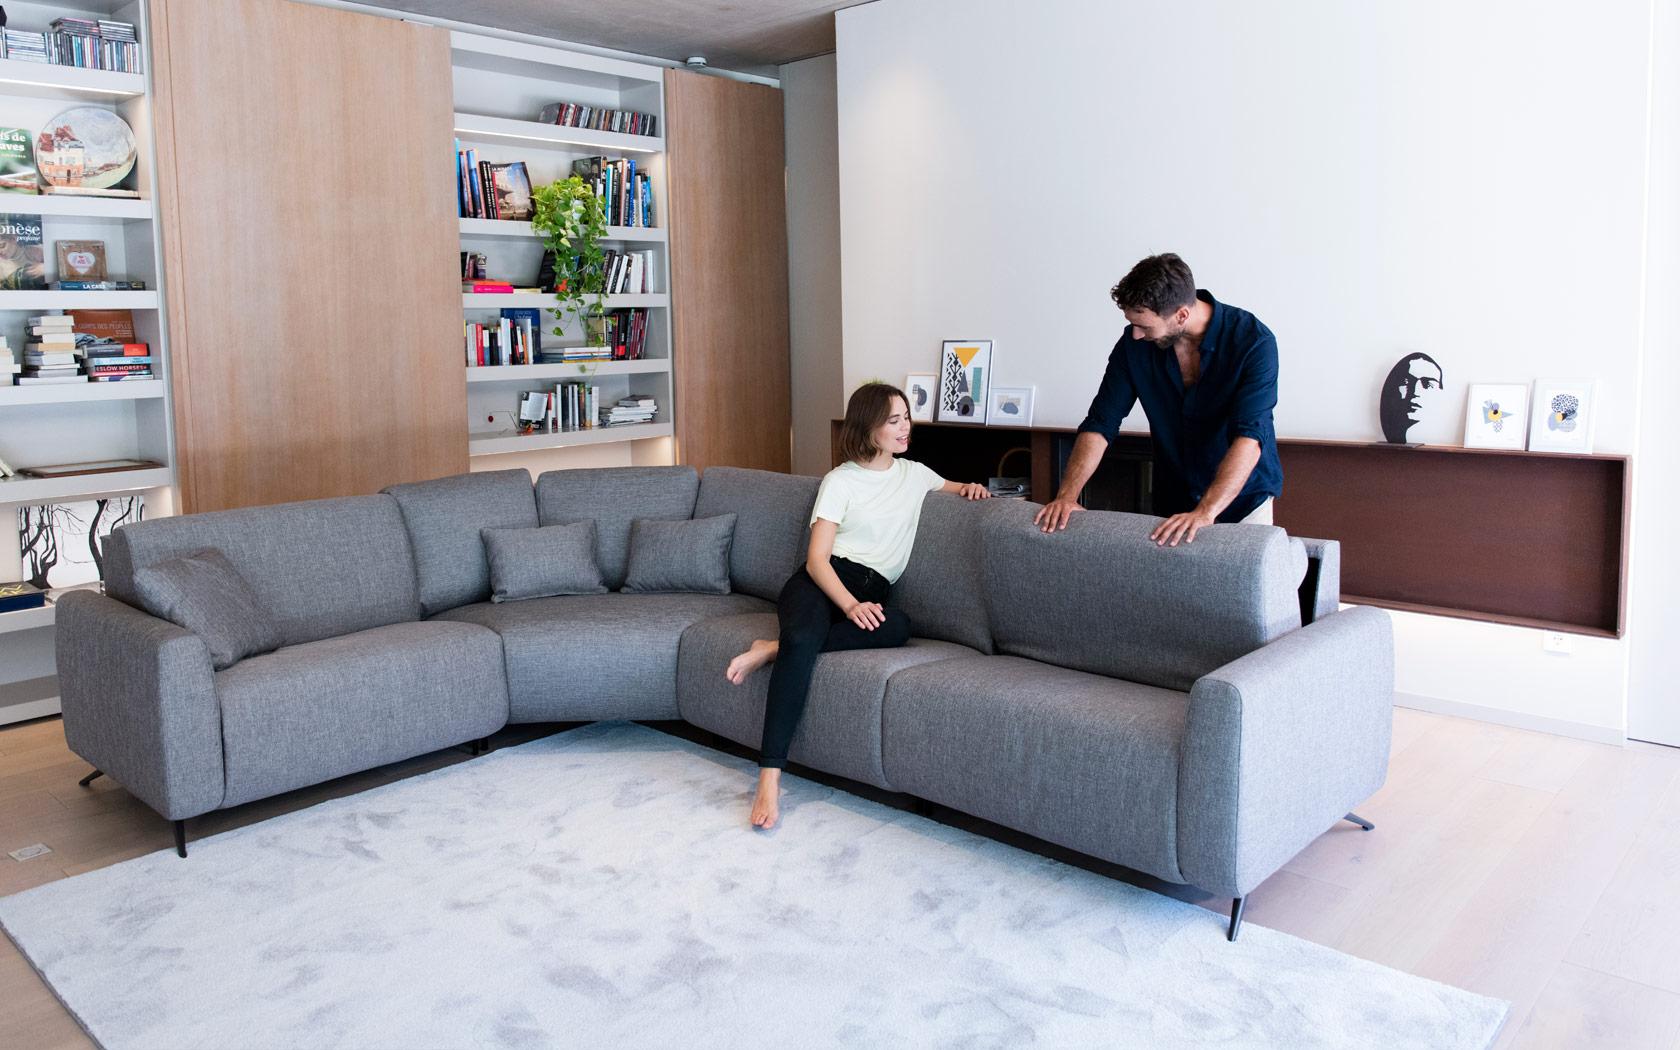 Atlanta sofa relax 2020 04